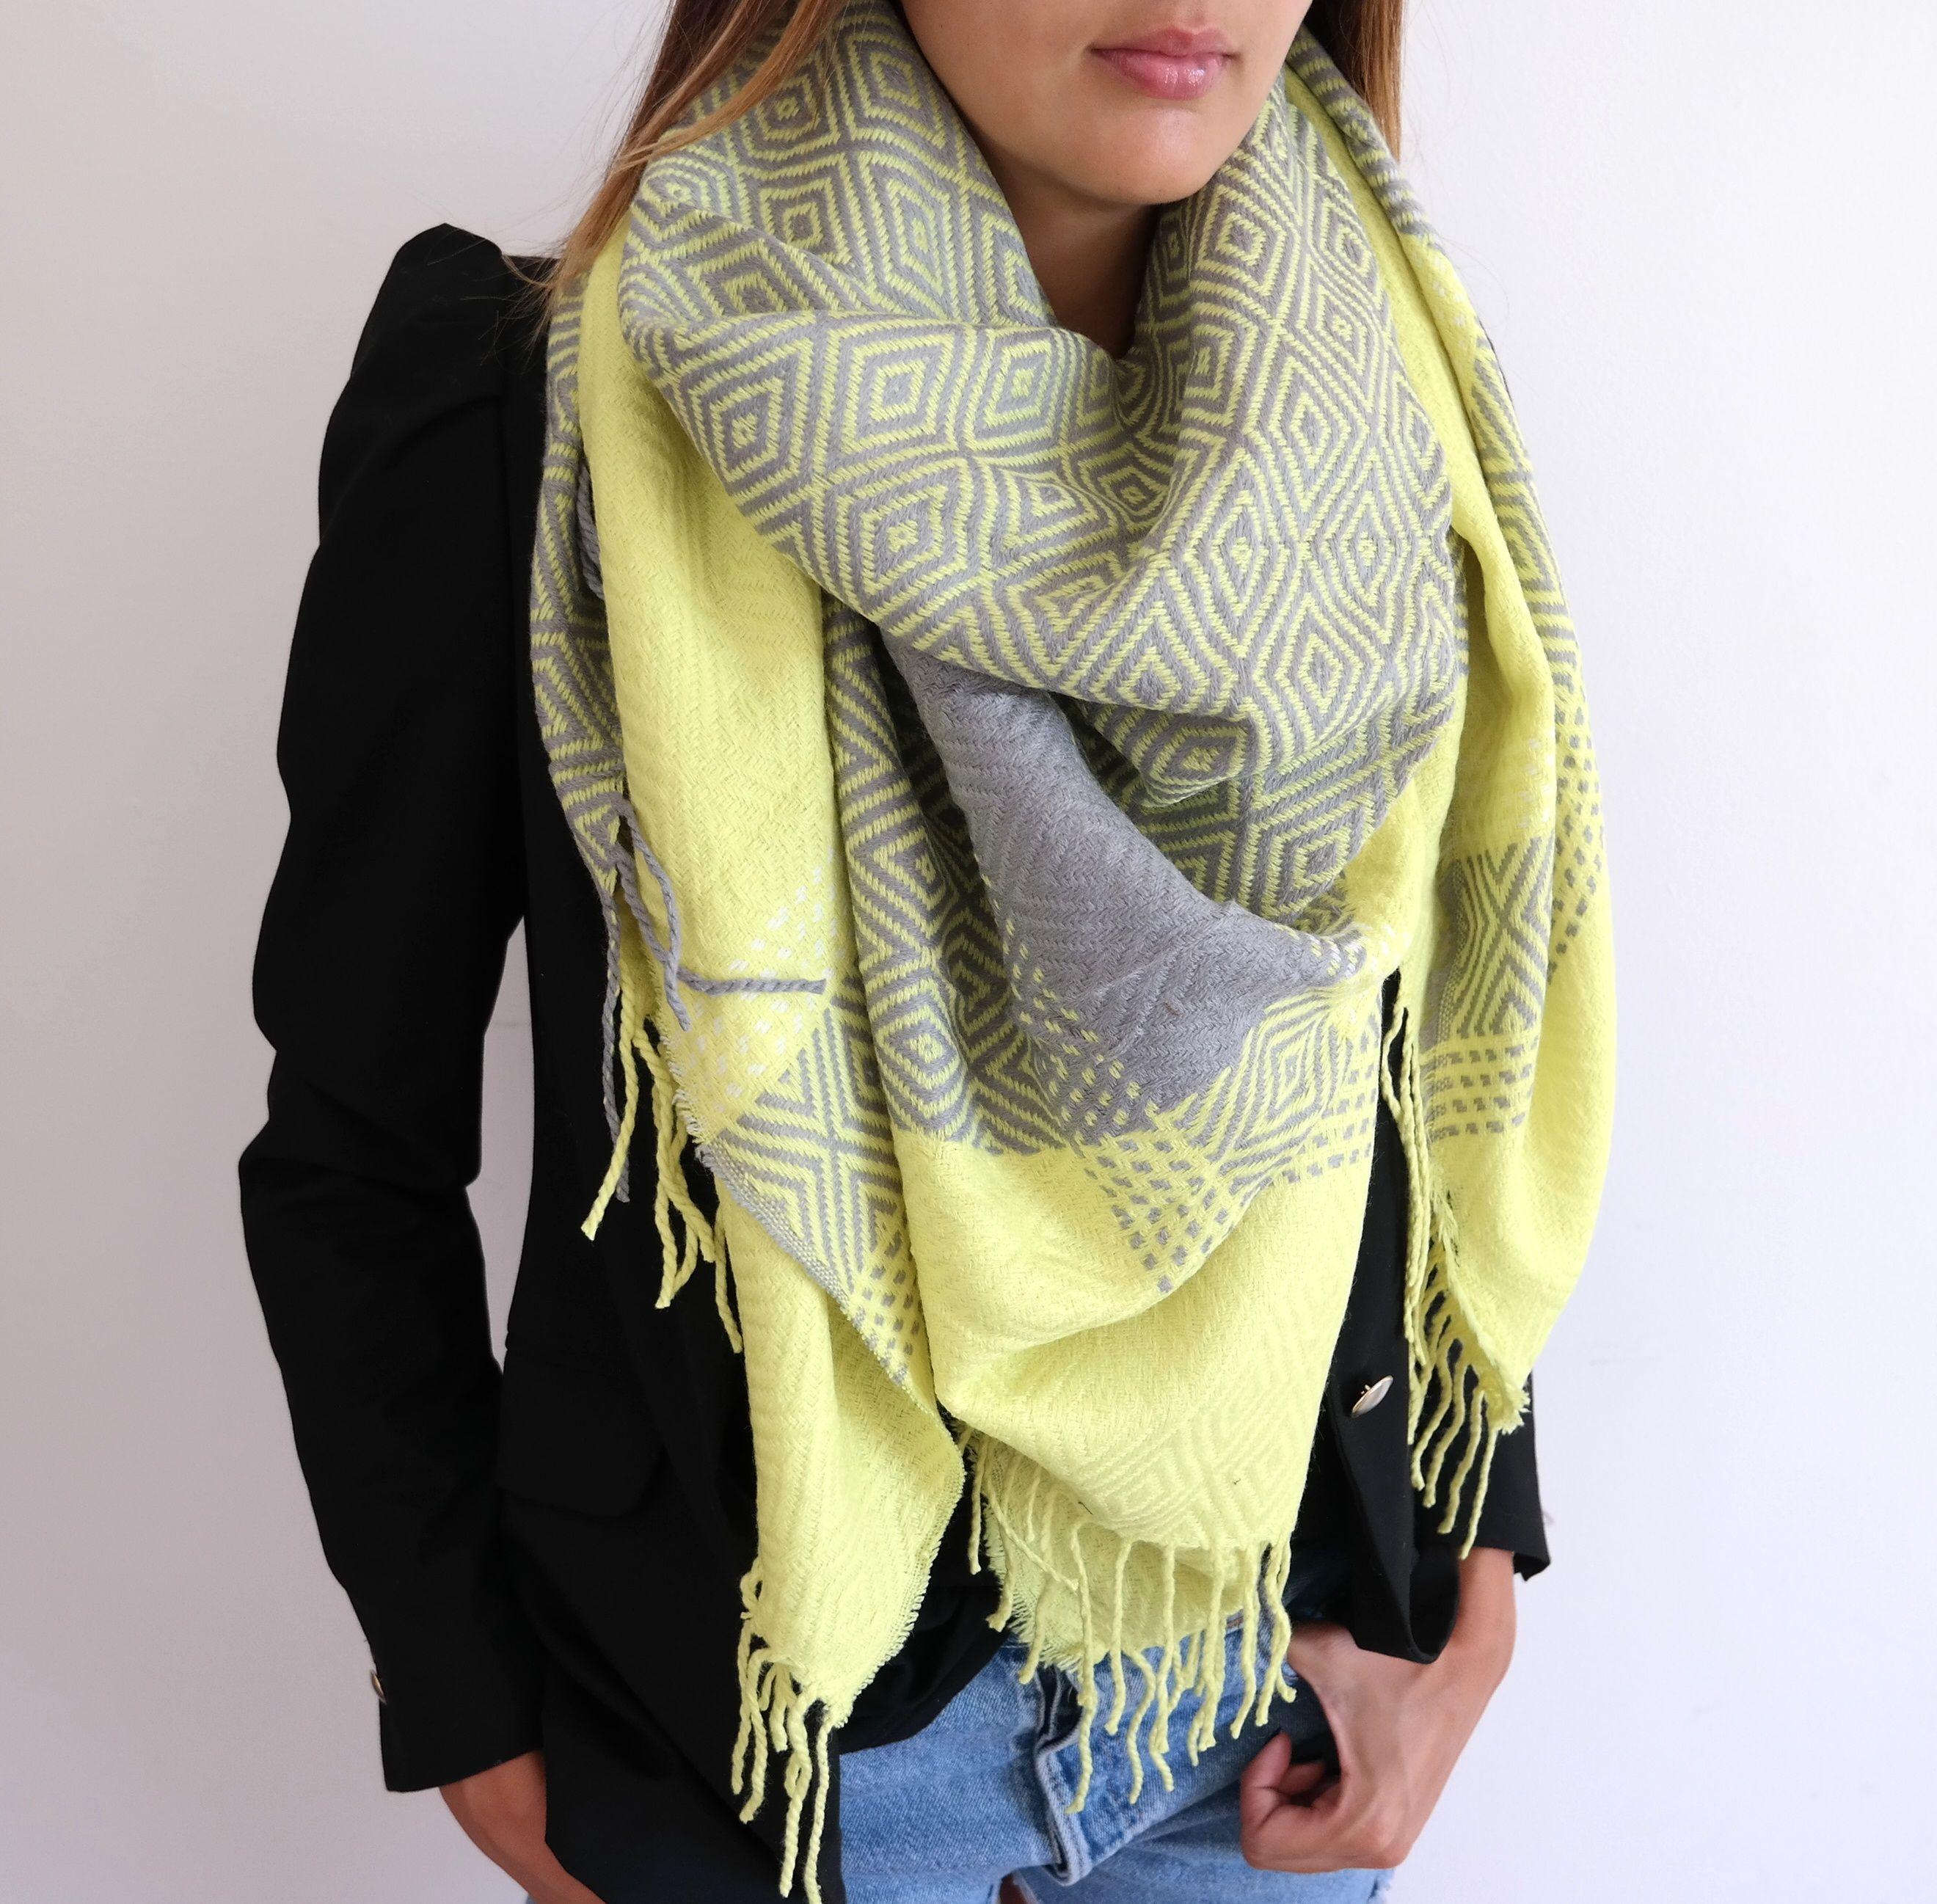 Echarpe jaune fluo - Idée pour s habiller 60adf233a5a